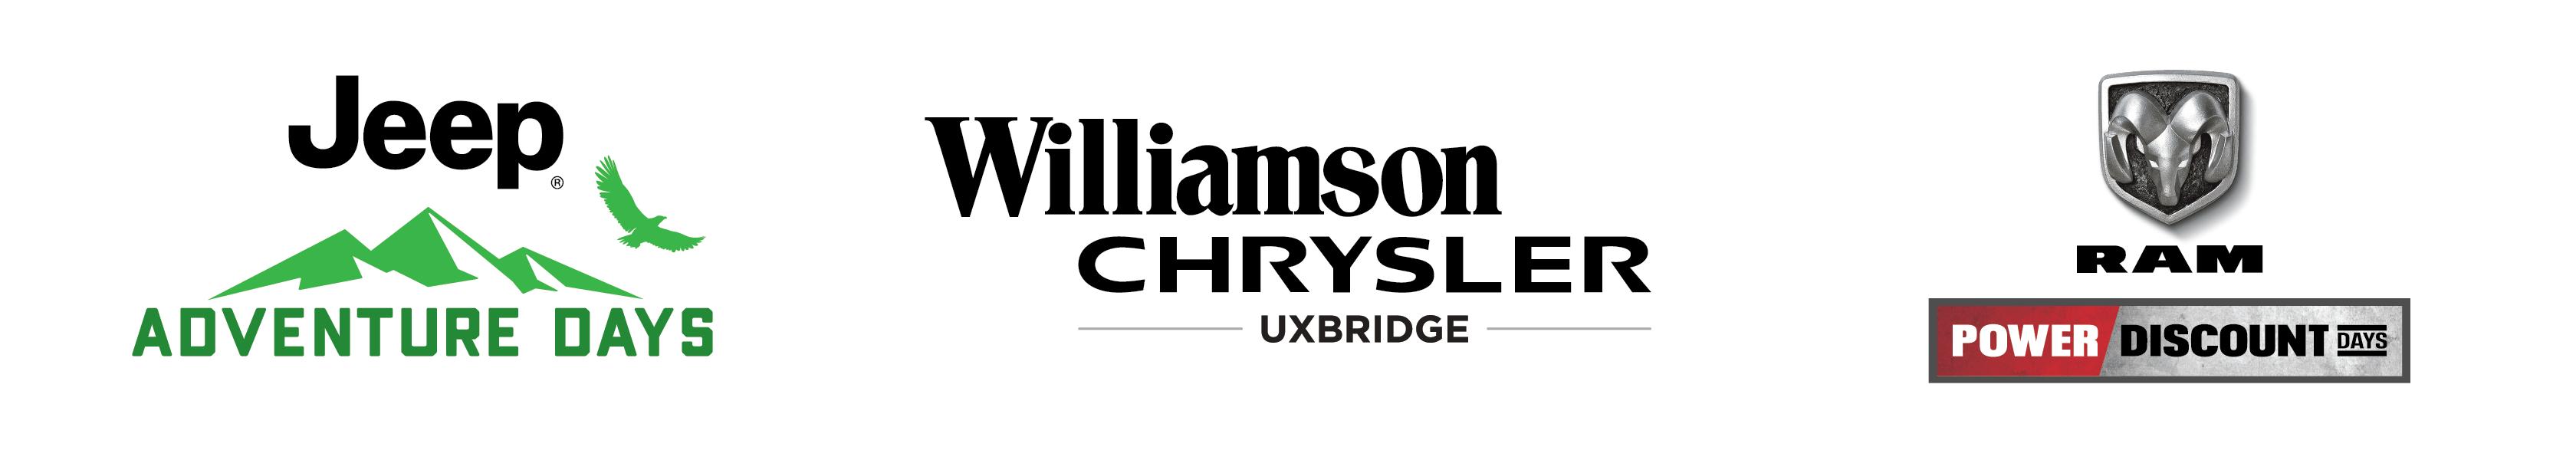 September 2021 Jeep Adventure Days and Ram Power Discount at Williamson Chrysler Uxbridge